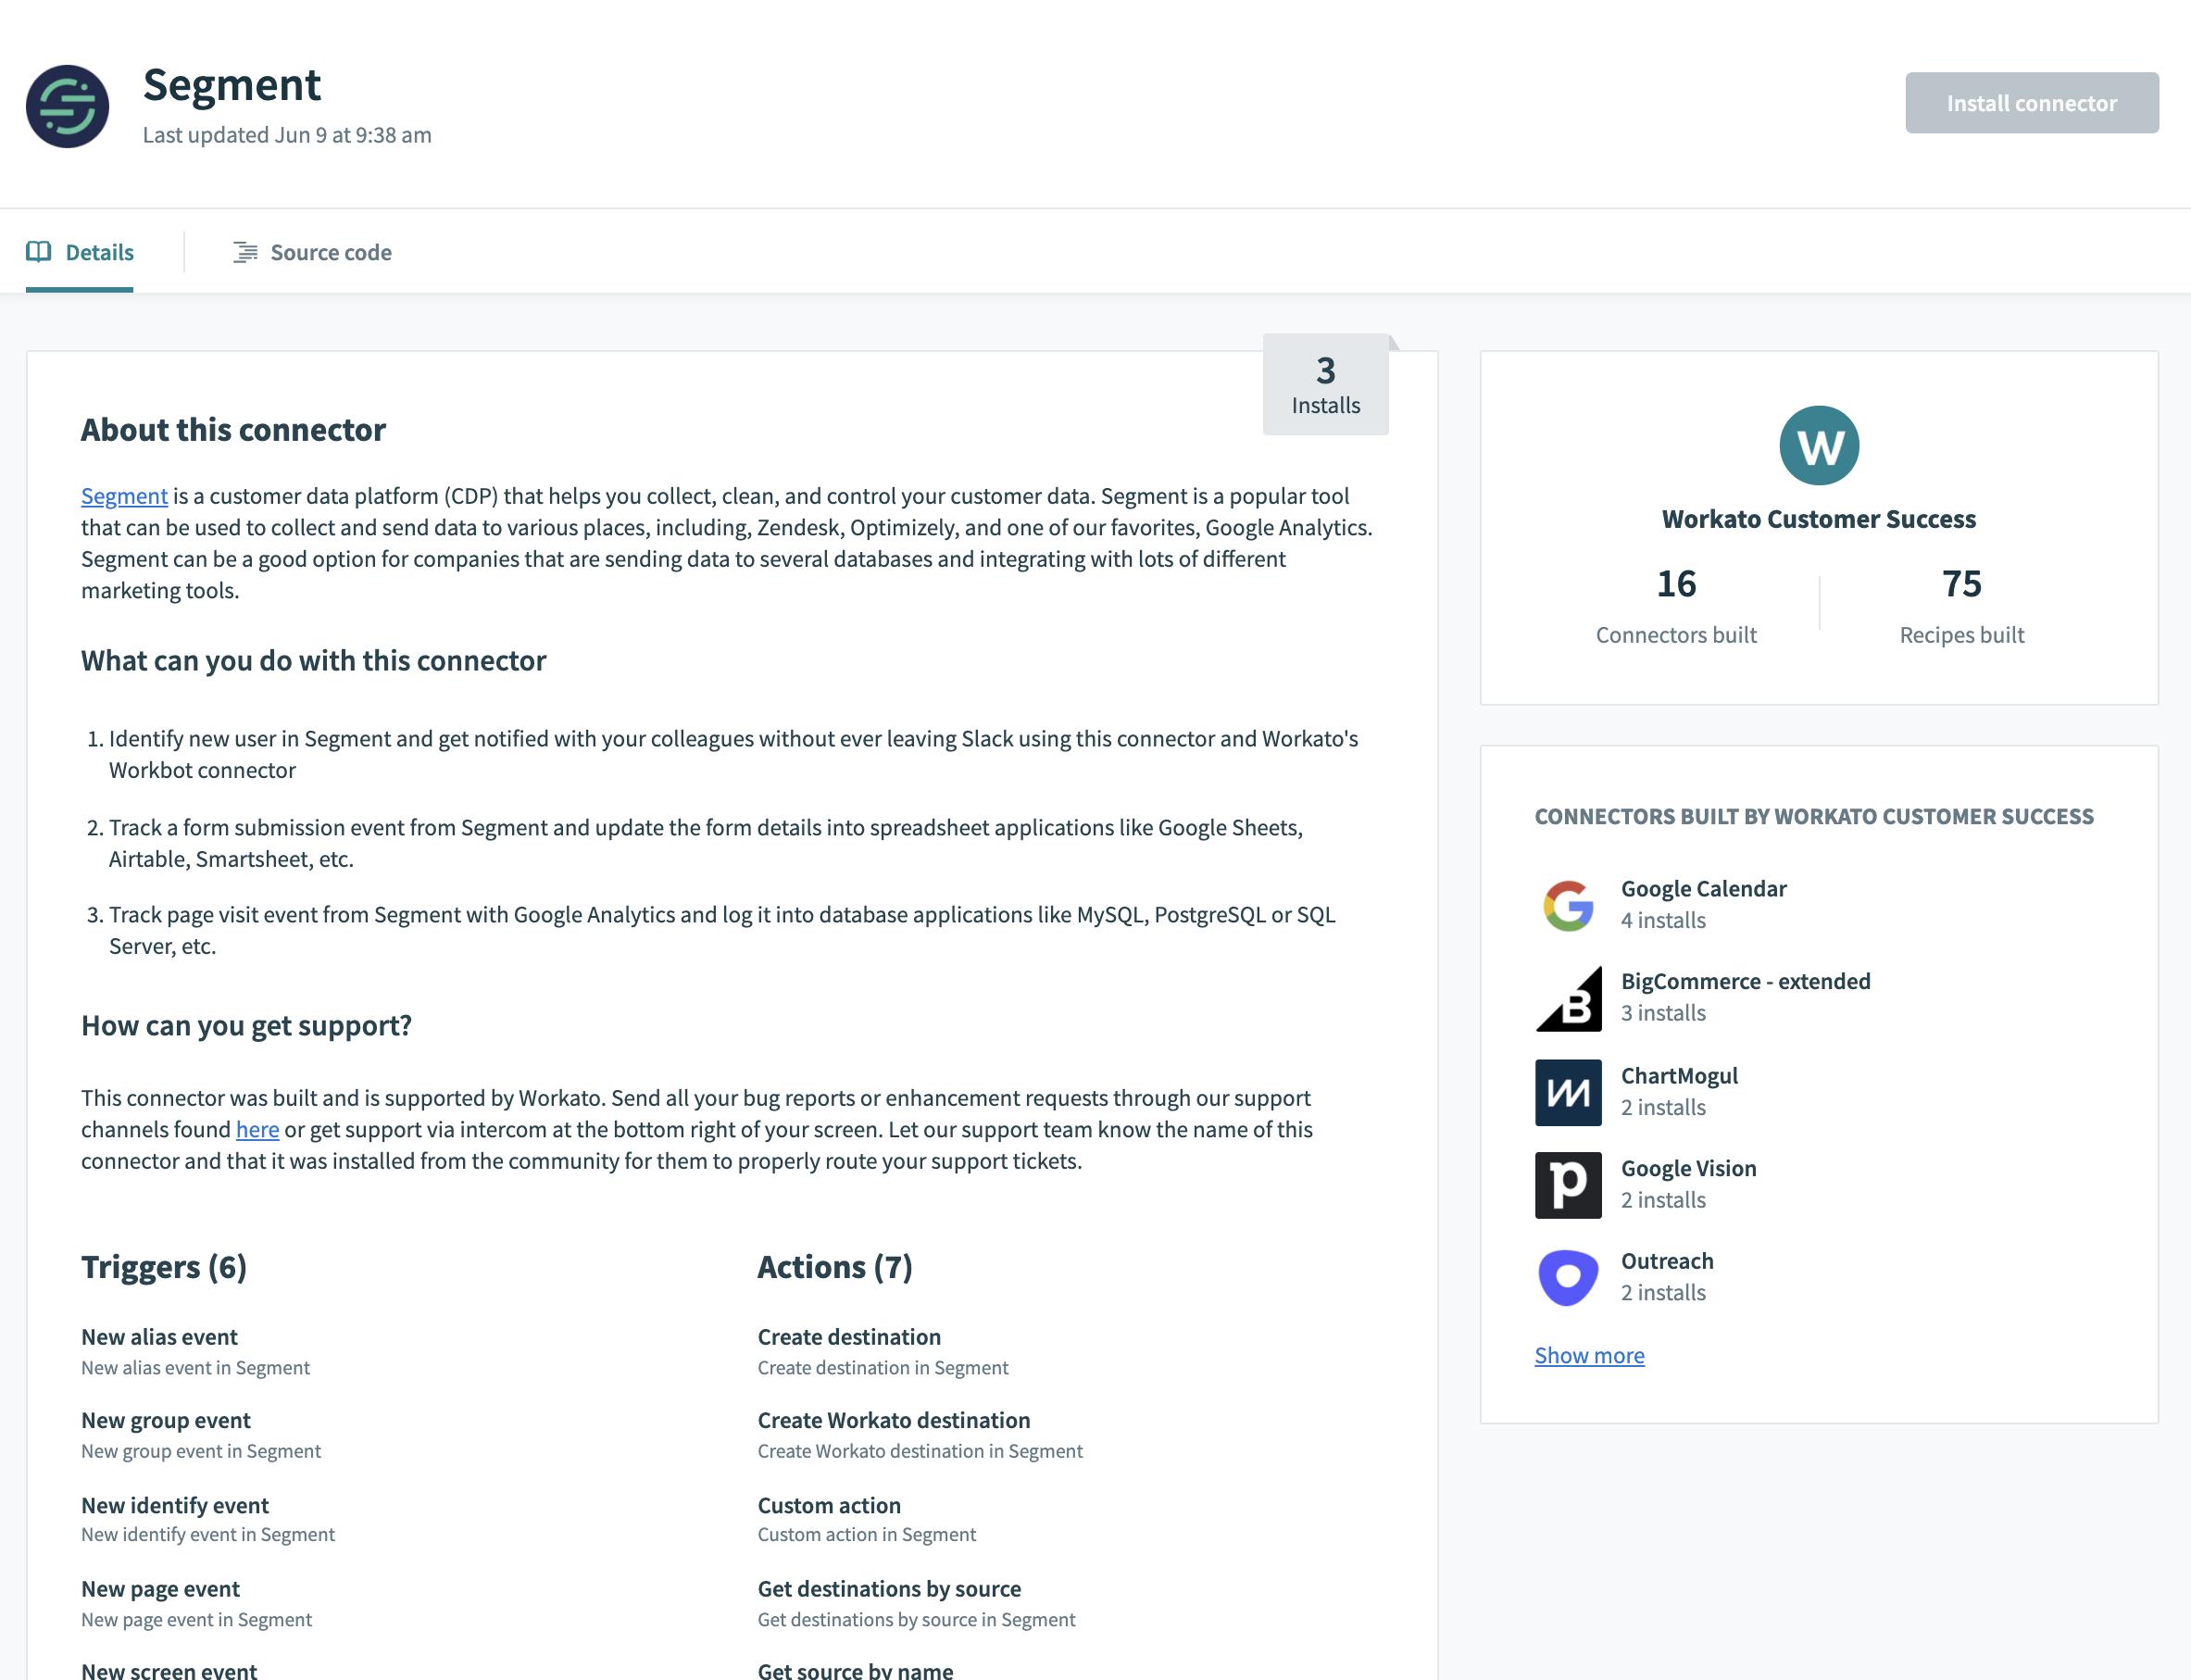 Segment Connector Landing Page